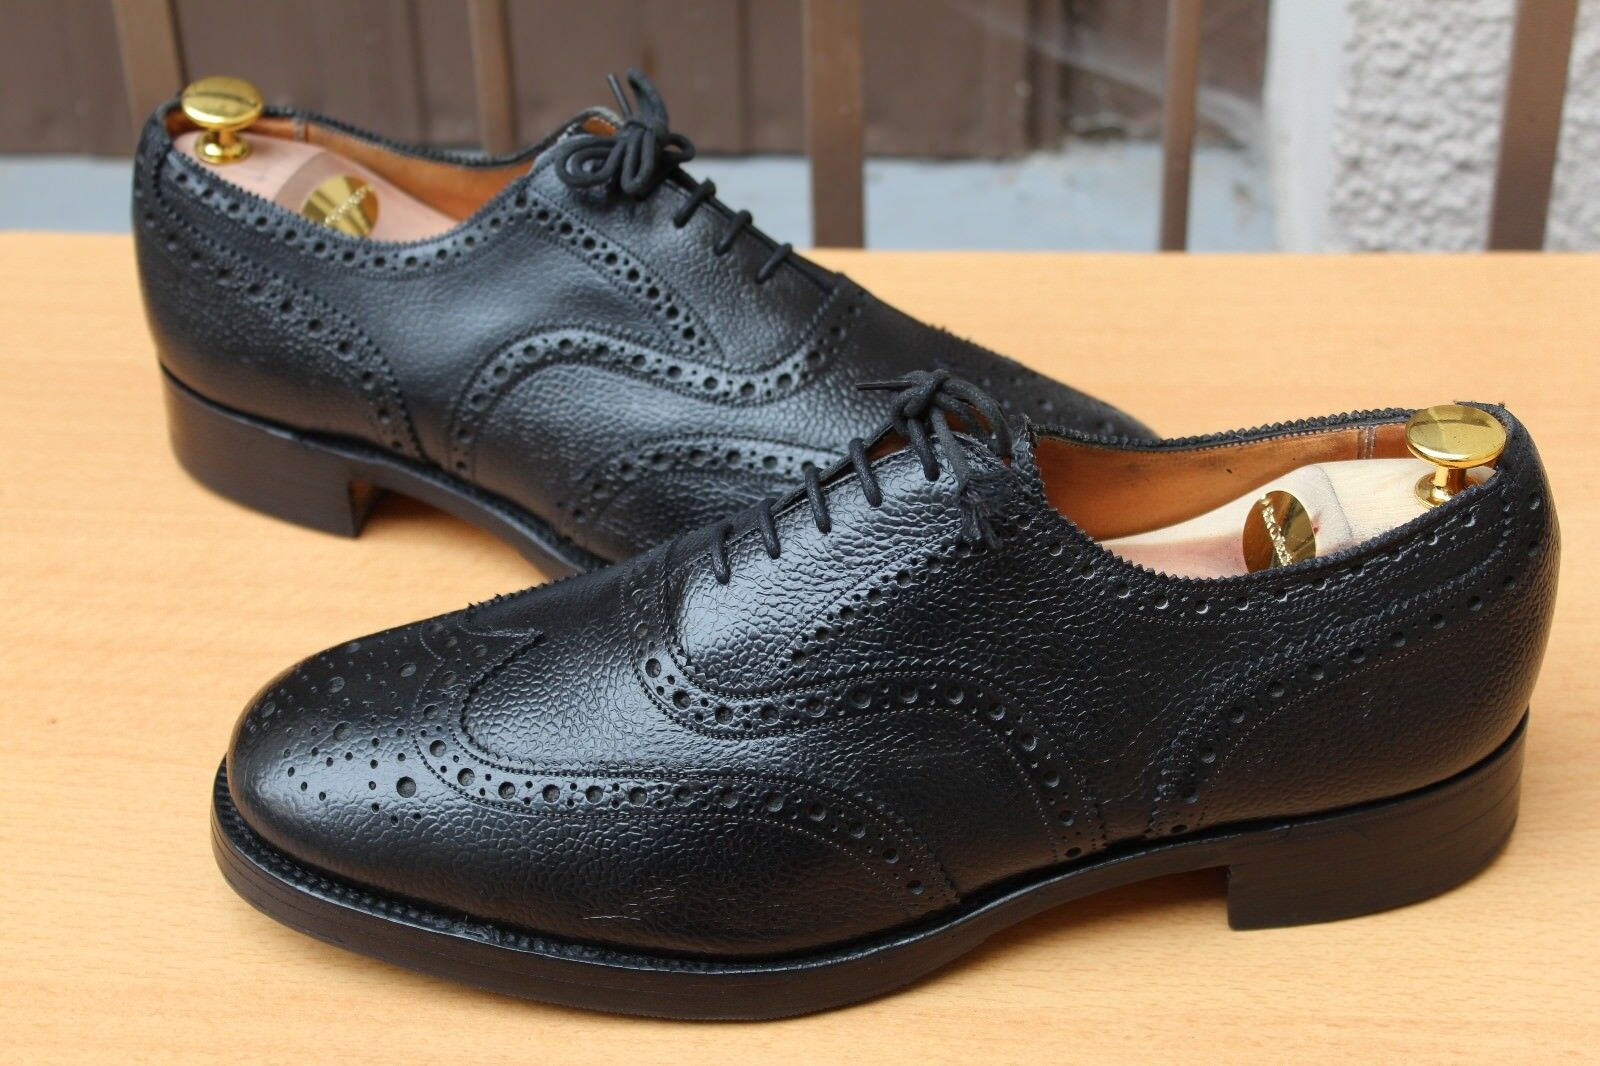 Chaussures SANDERS RICHELIEU CUIR GRAINE 11 UK  45  ETAT NEUVE chaussures 289 EUROS